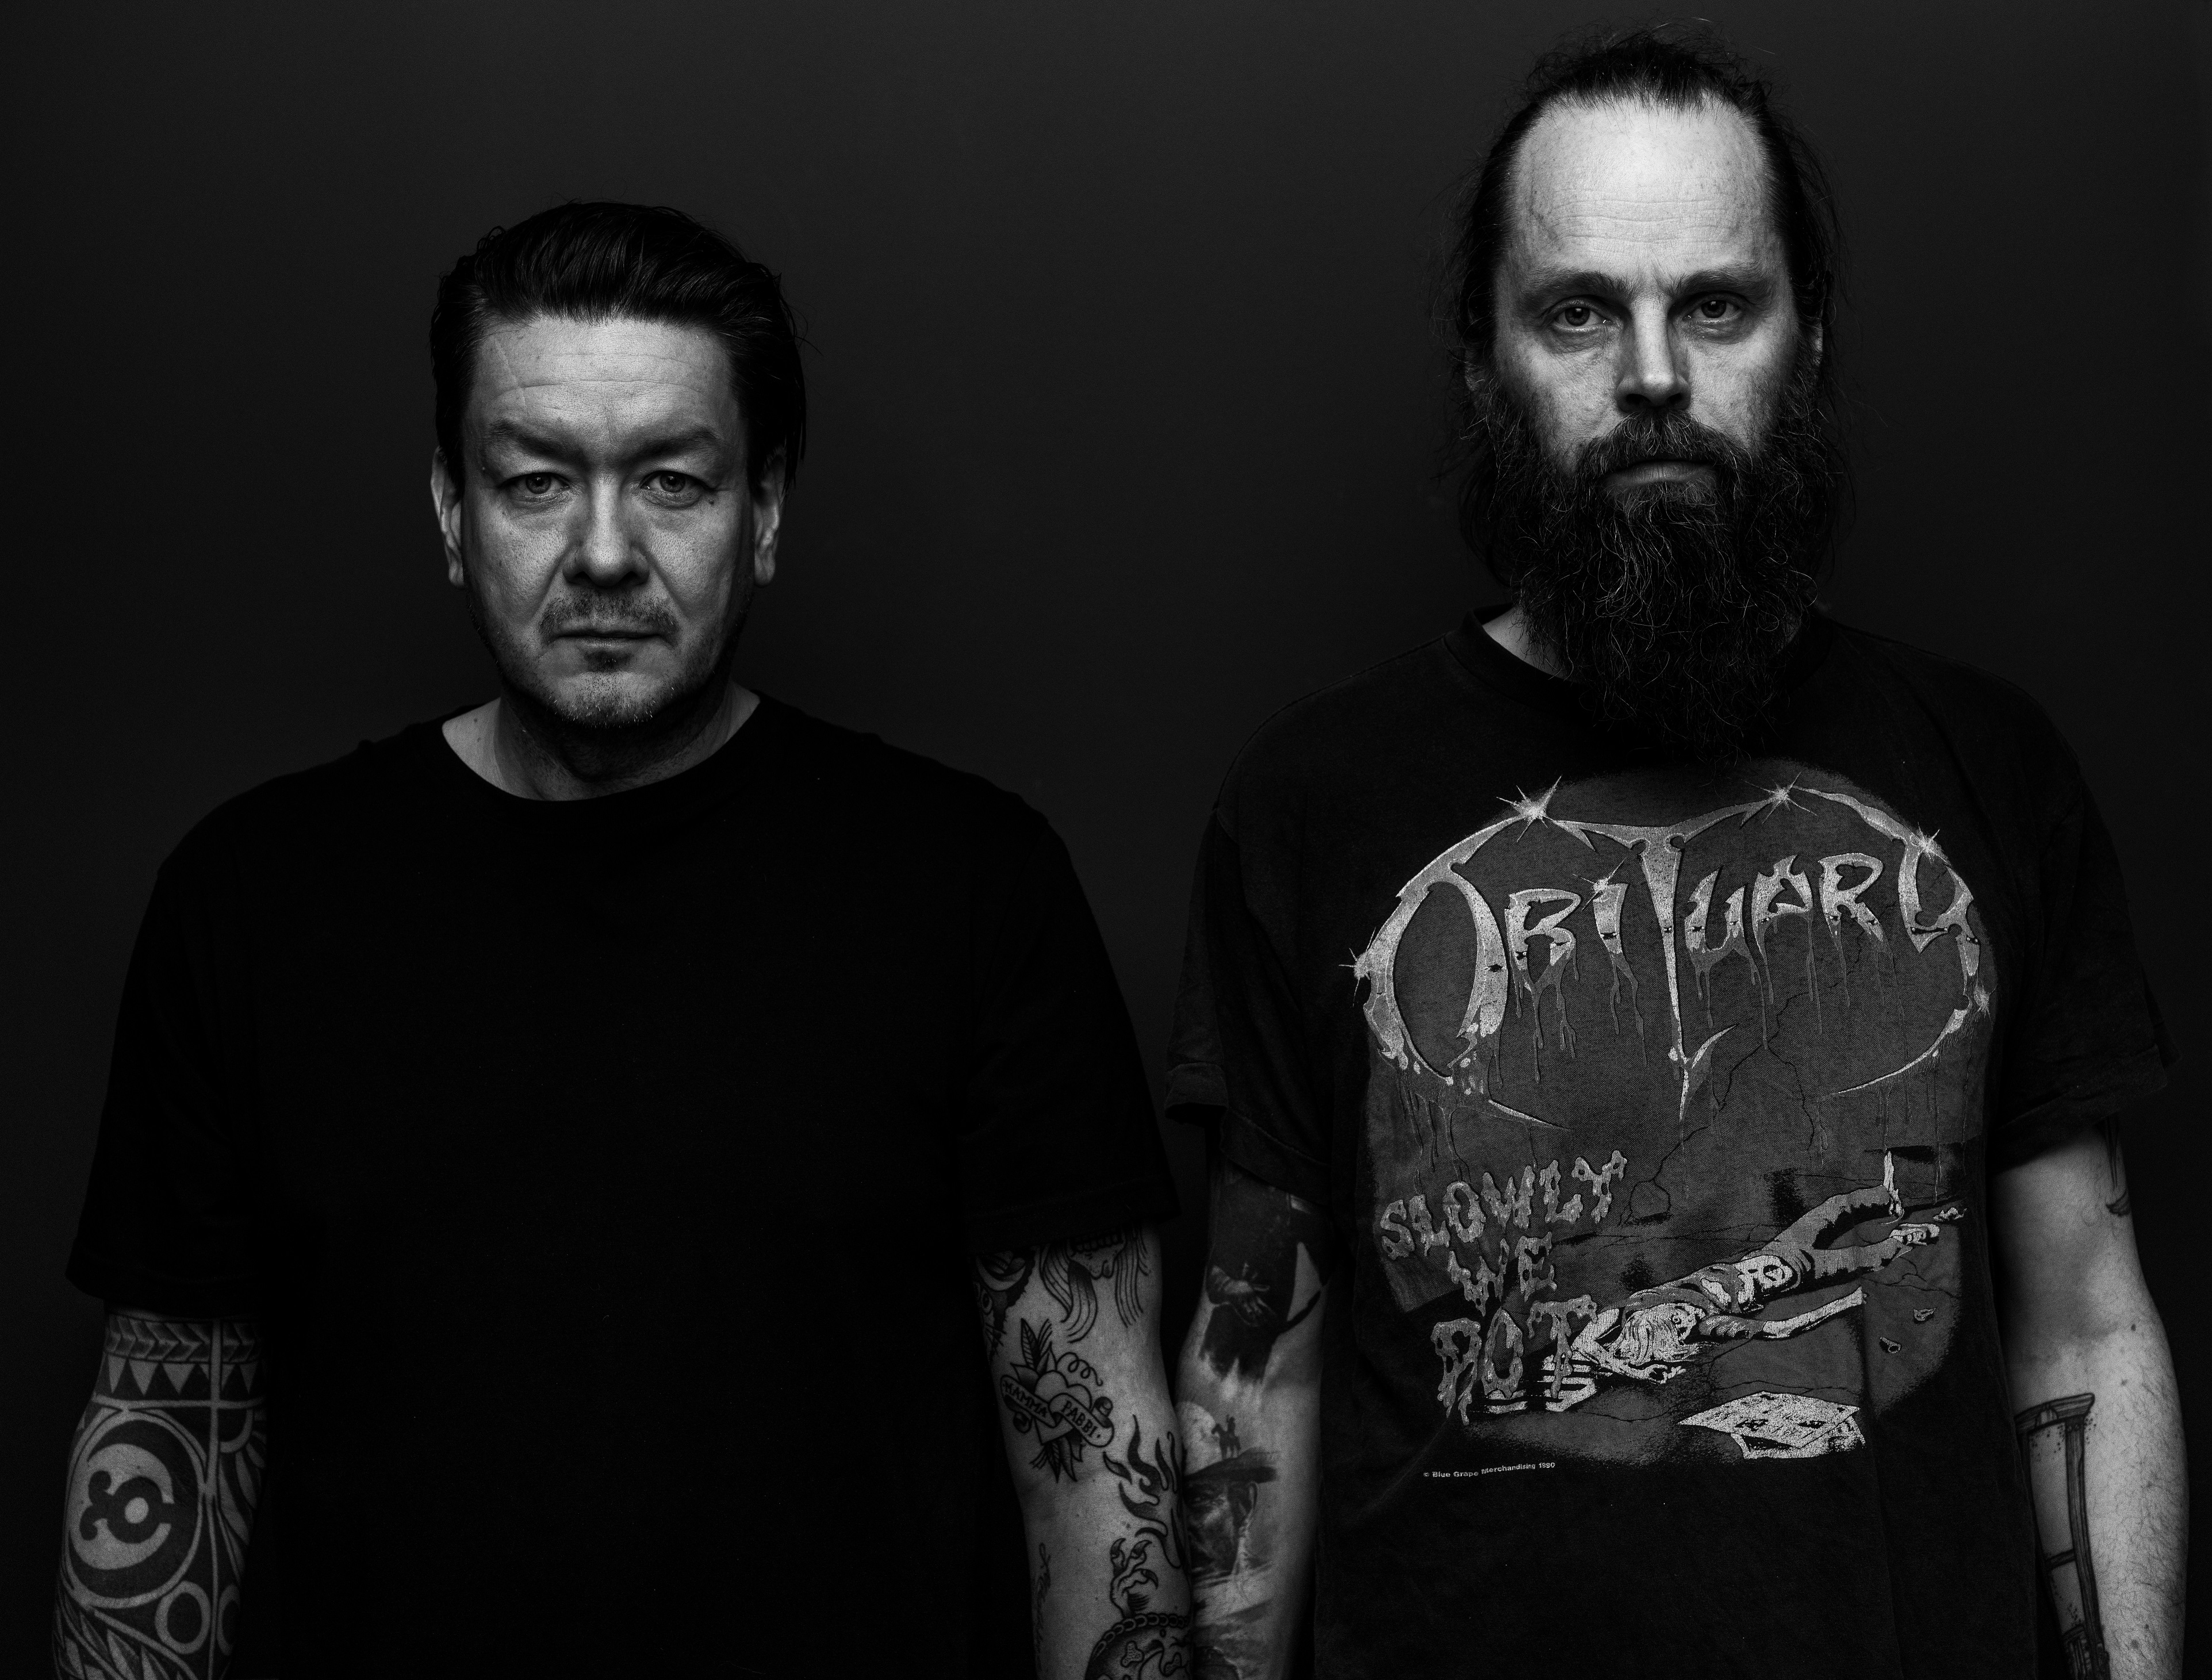 bastardur-duo-2-rumar-hrodi-geirmundsson-bw.jpg